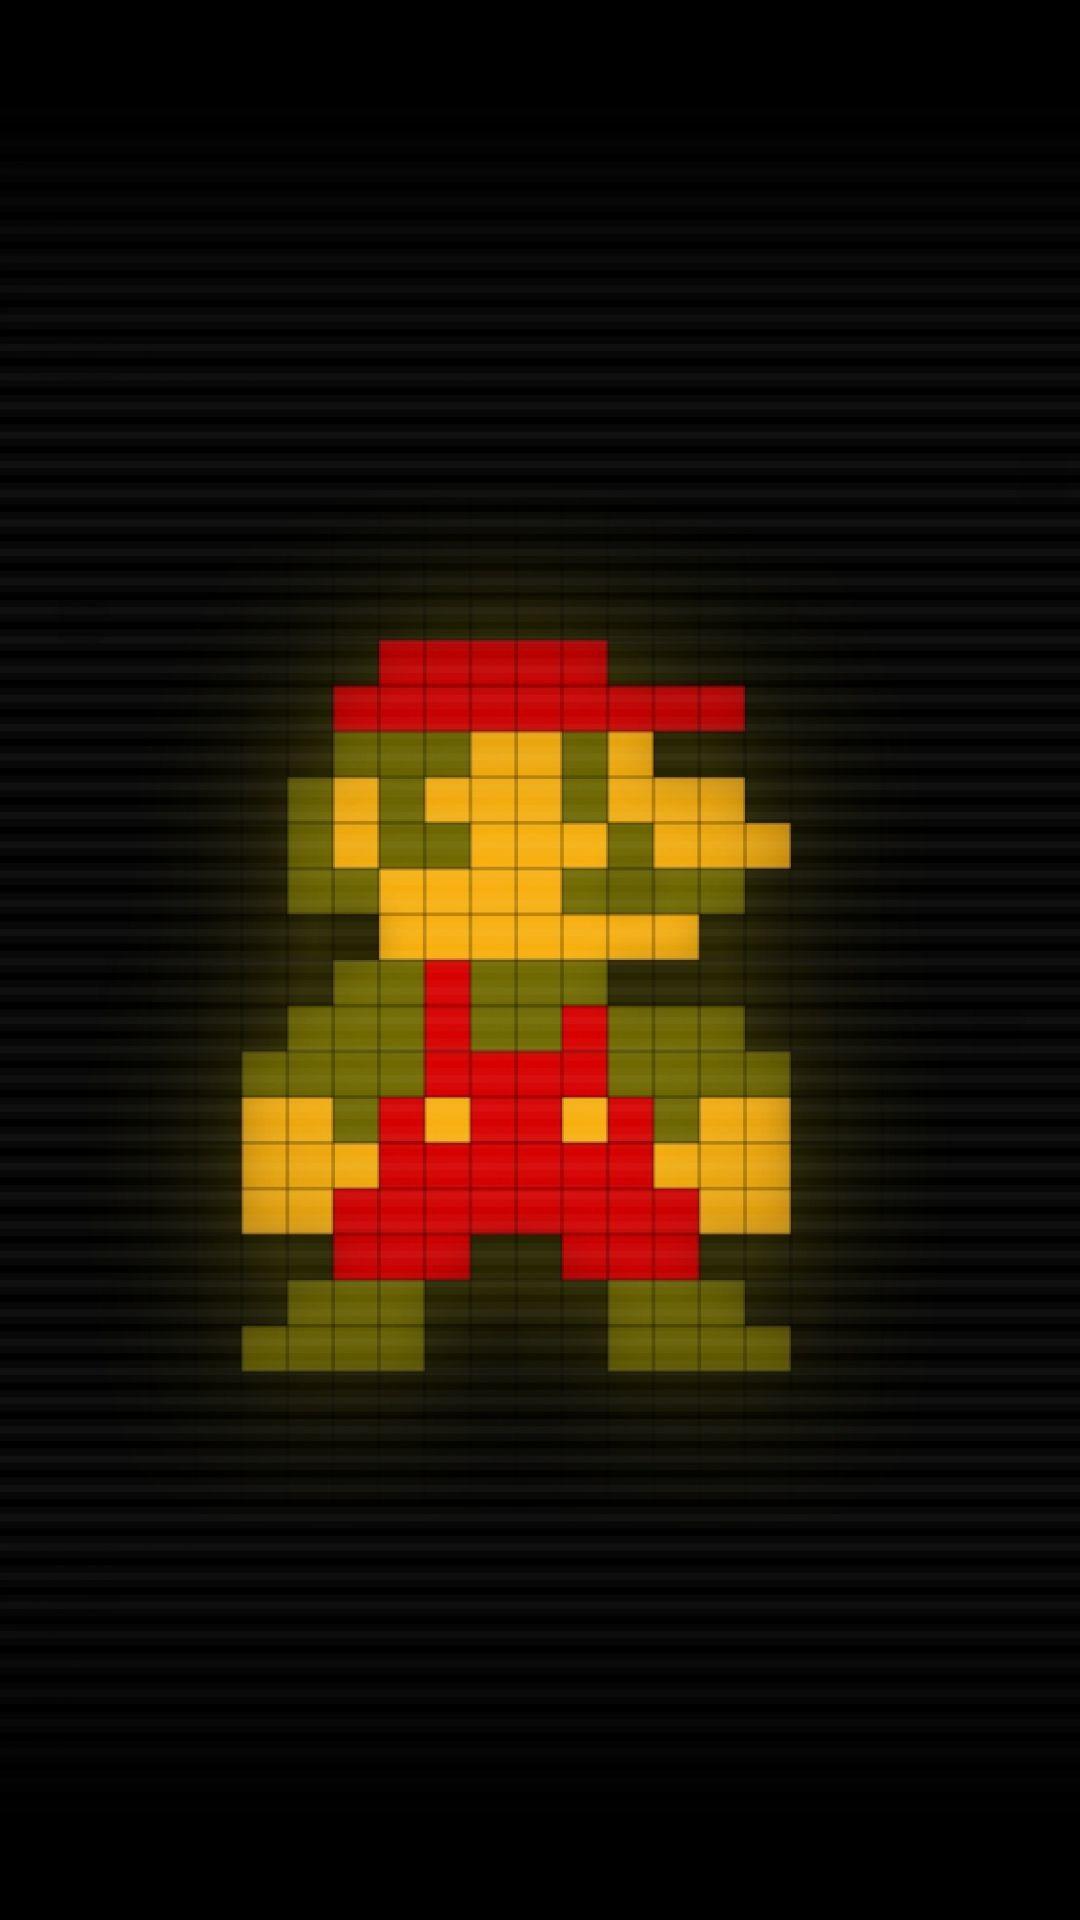 Res: 1080x1920, hd pixel art super mario bros wallpaper for mobile (JPEG Image,  1080 × 1920 pixels) - Scaled (31%)